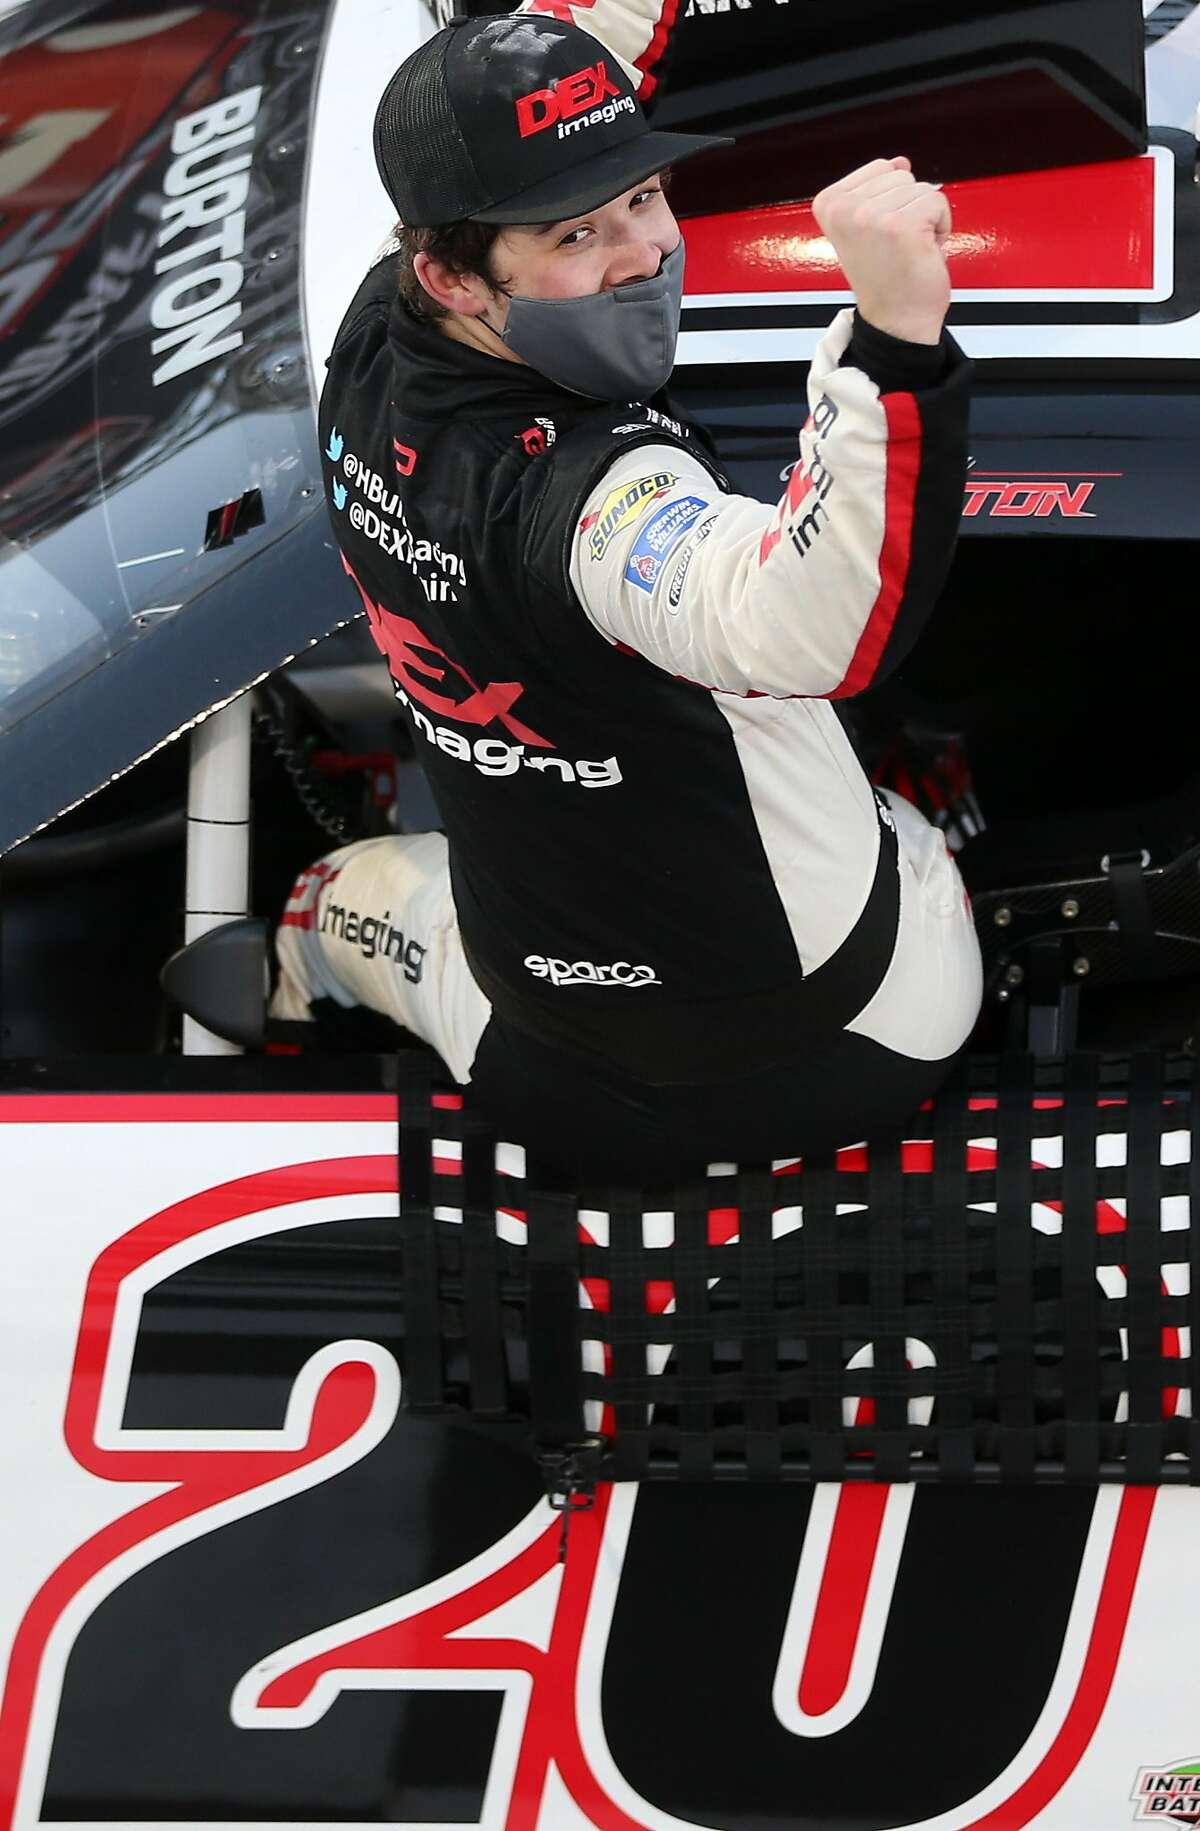 Harrison Burton celebrates after winning the NASCAR Xfinity Series race at Martinsville Speedway in Virginia.